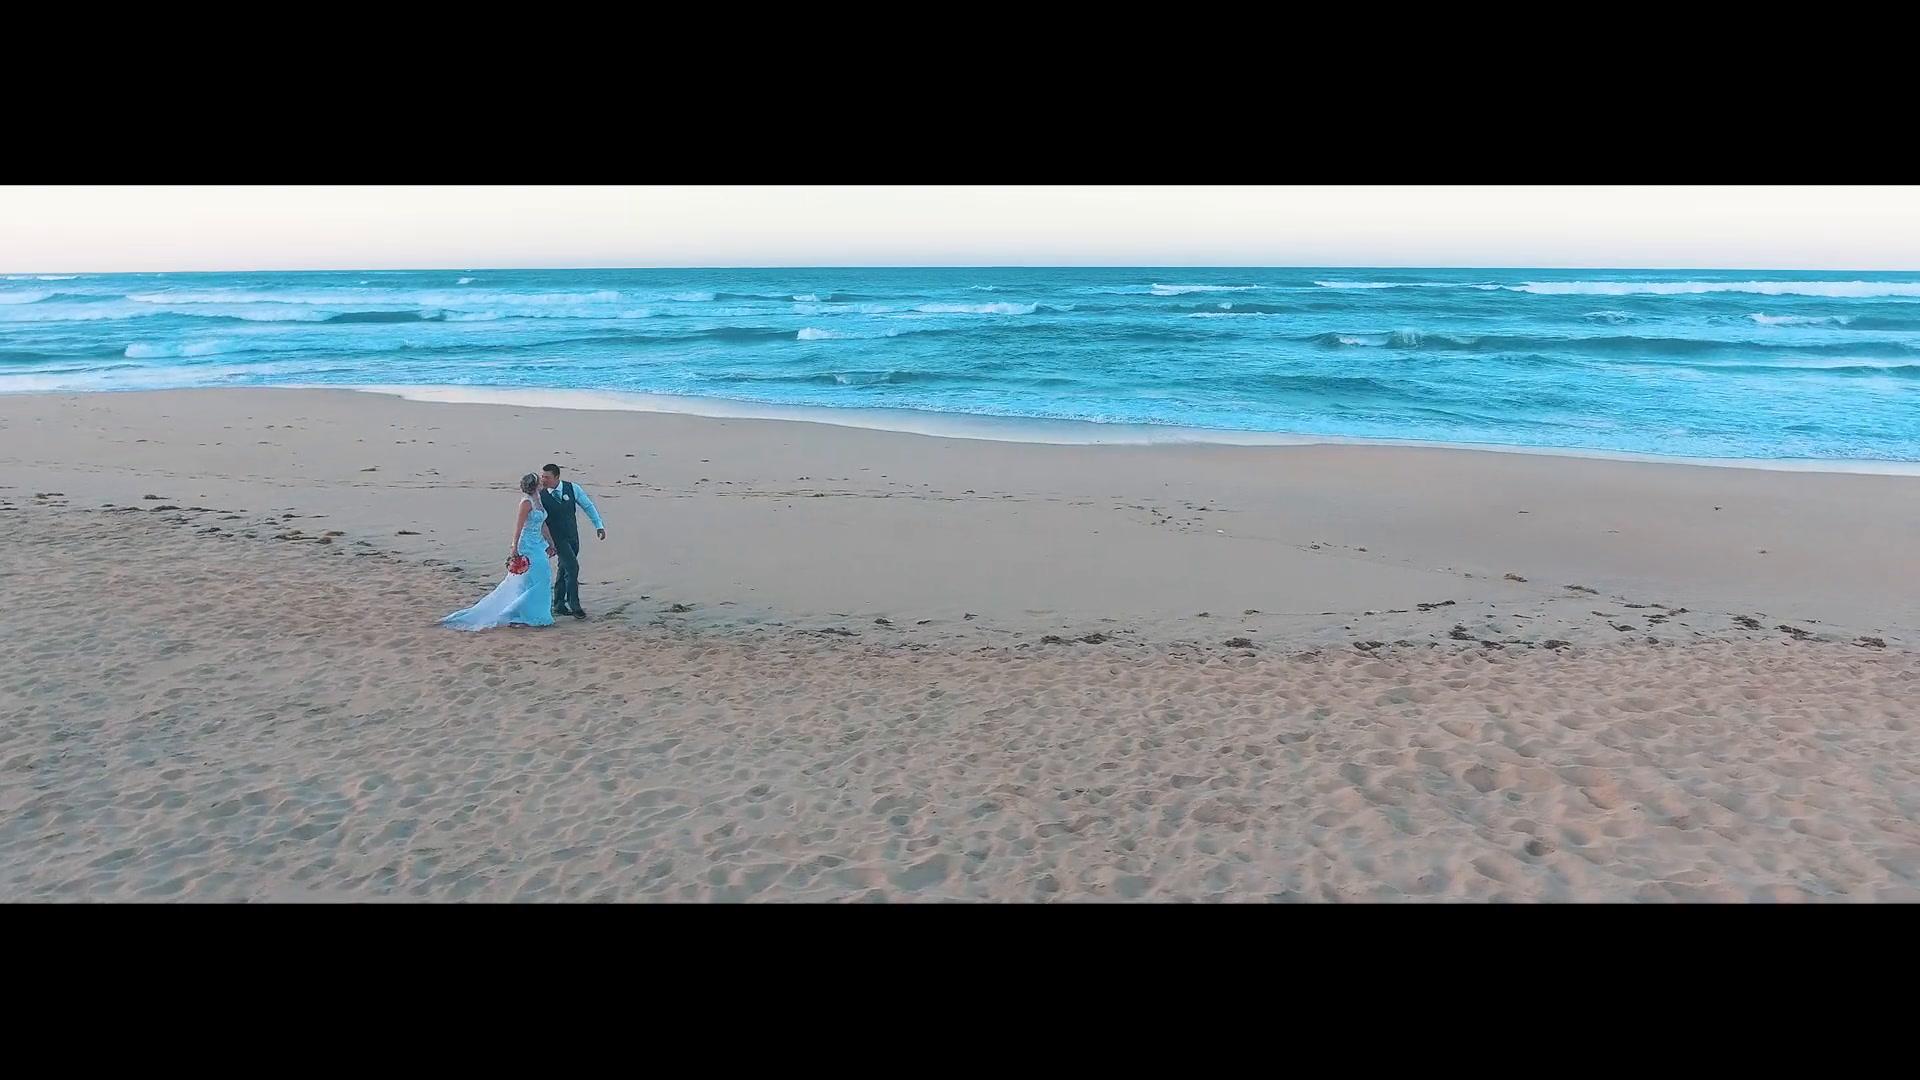 Jefrey + Nathalie   Punta Cana, Dominican Republic   a beach